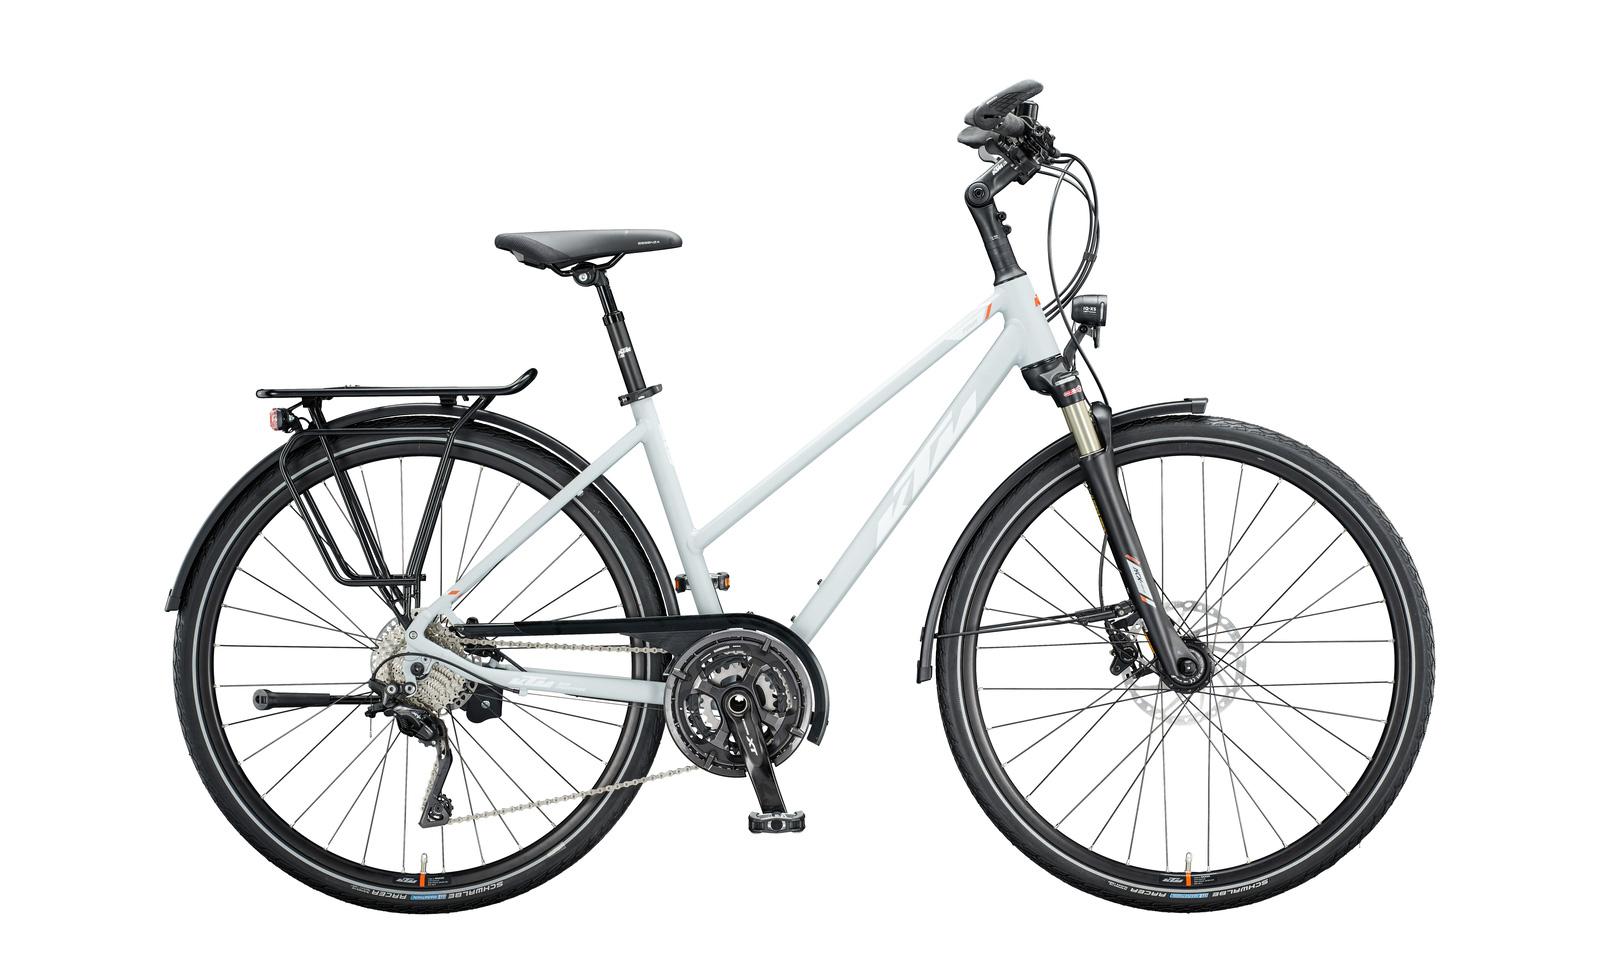 Biciclete KTM Trekking Onroad LIFE TOUR 3x10 Shimano Deore XT